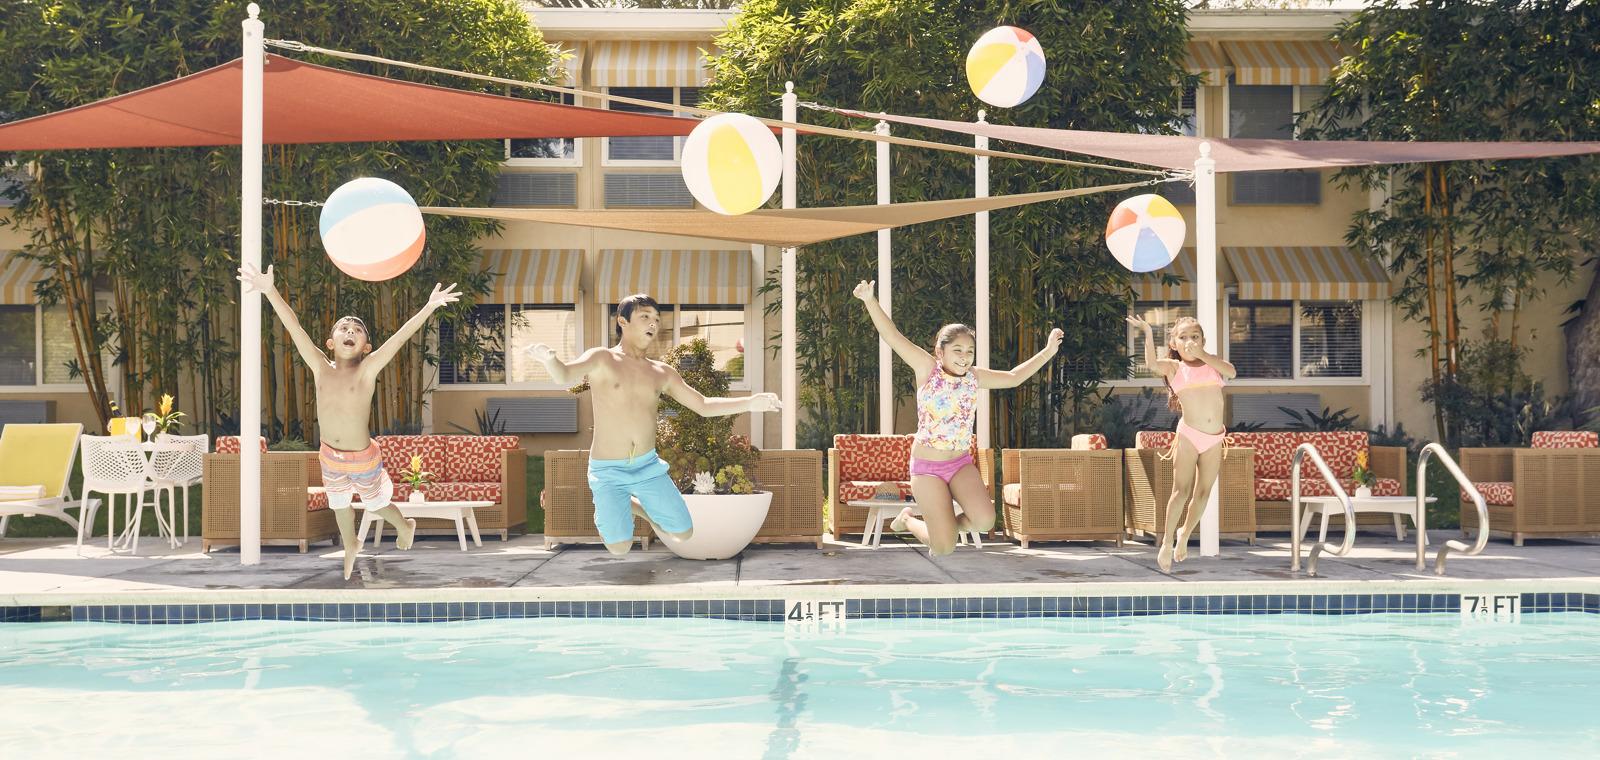 Wild Palms_Kids_Playing in Pool_HighRes